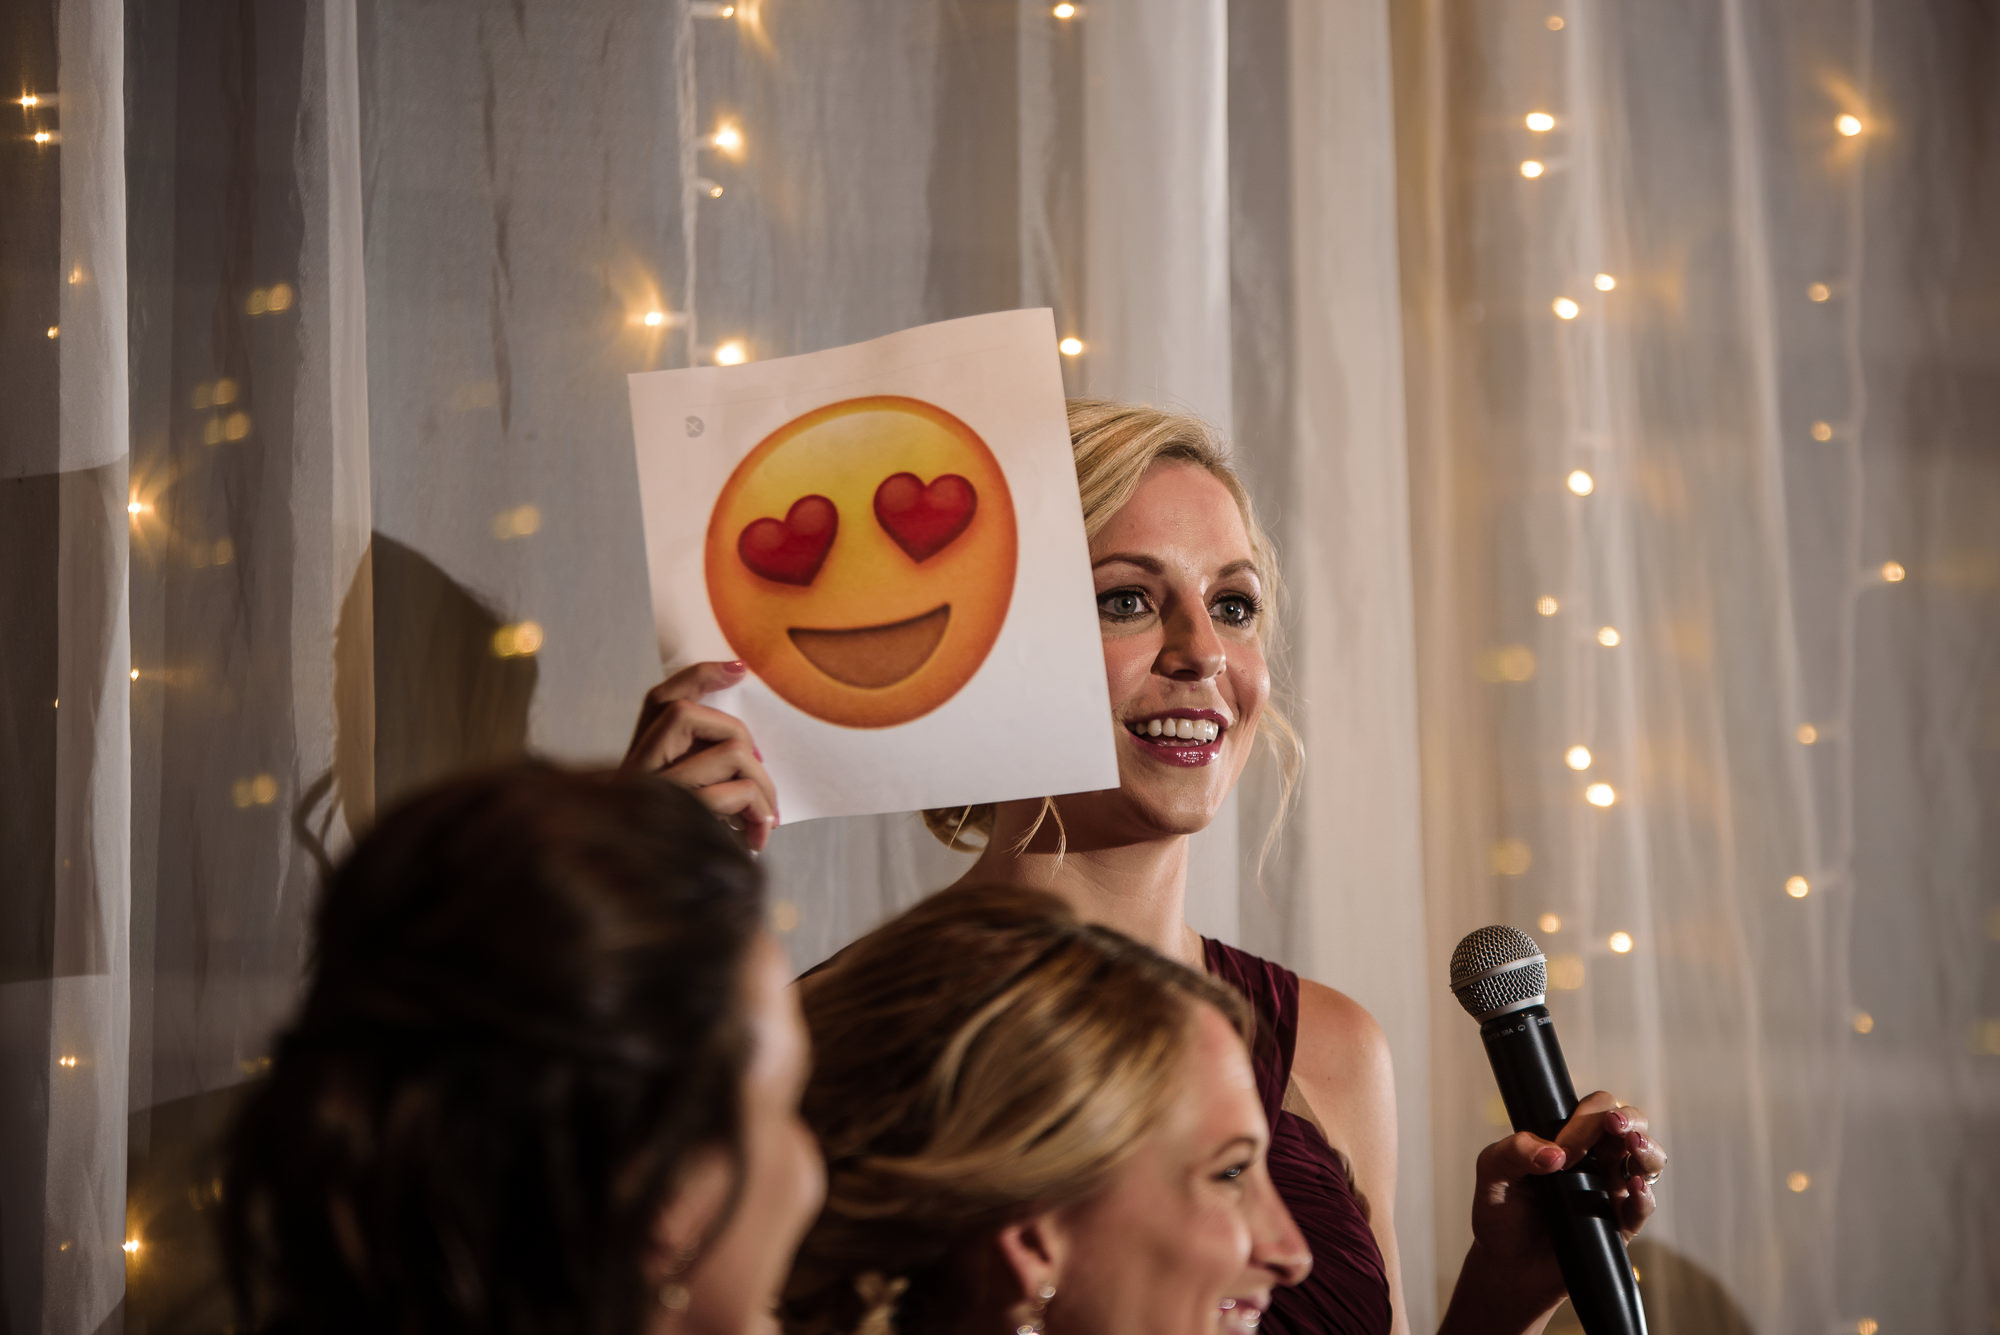 KEVIN-STACY-NOAHS-EVENT-VENUE-OMAHA-WEDDING-PHOTOGRAPHER-027.jpg